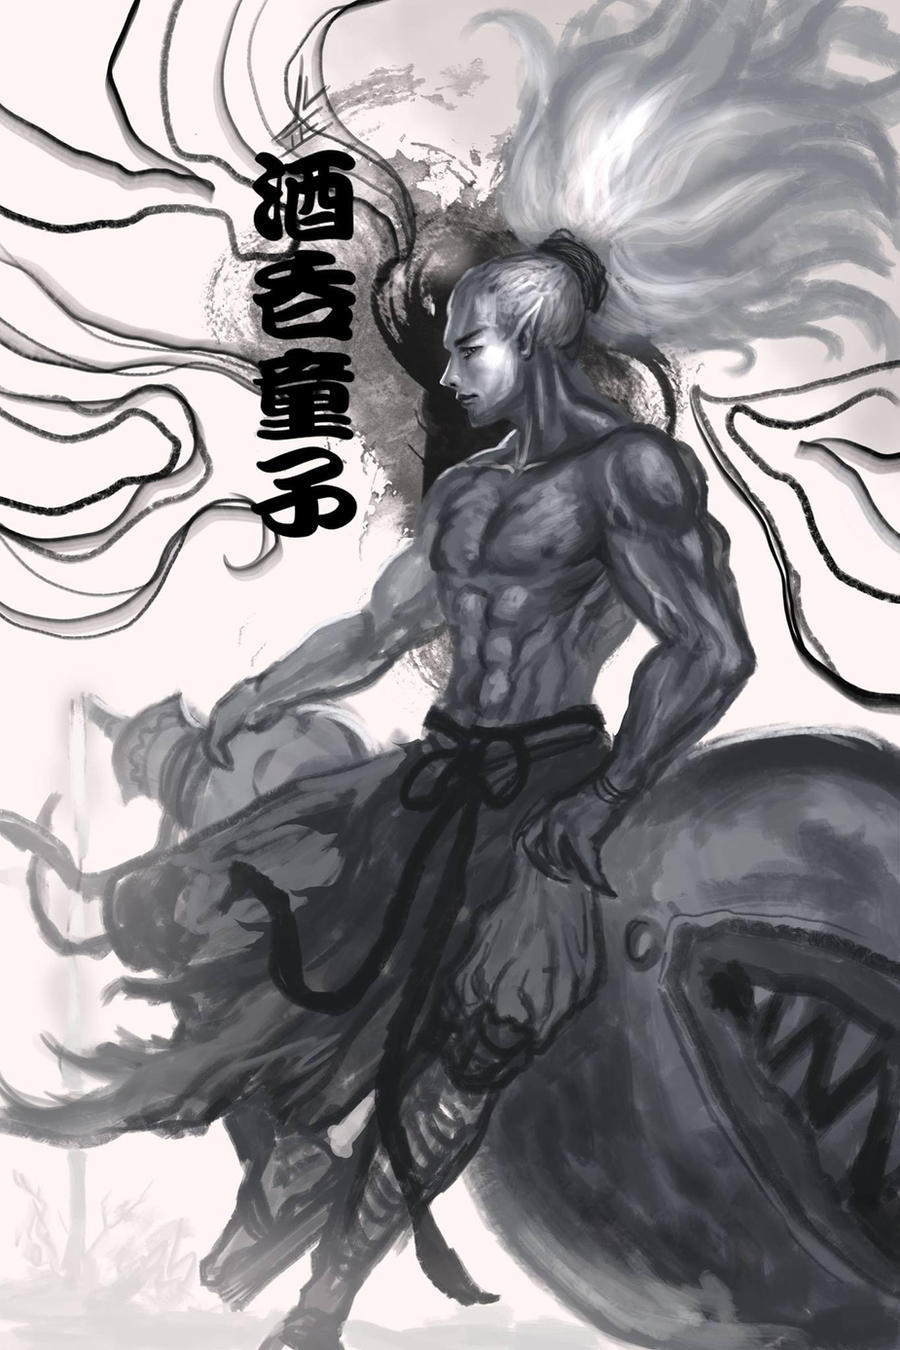 Onmyoshi Fanart Portrait: Drunkard Demon Boy by DreadJim